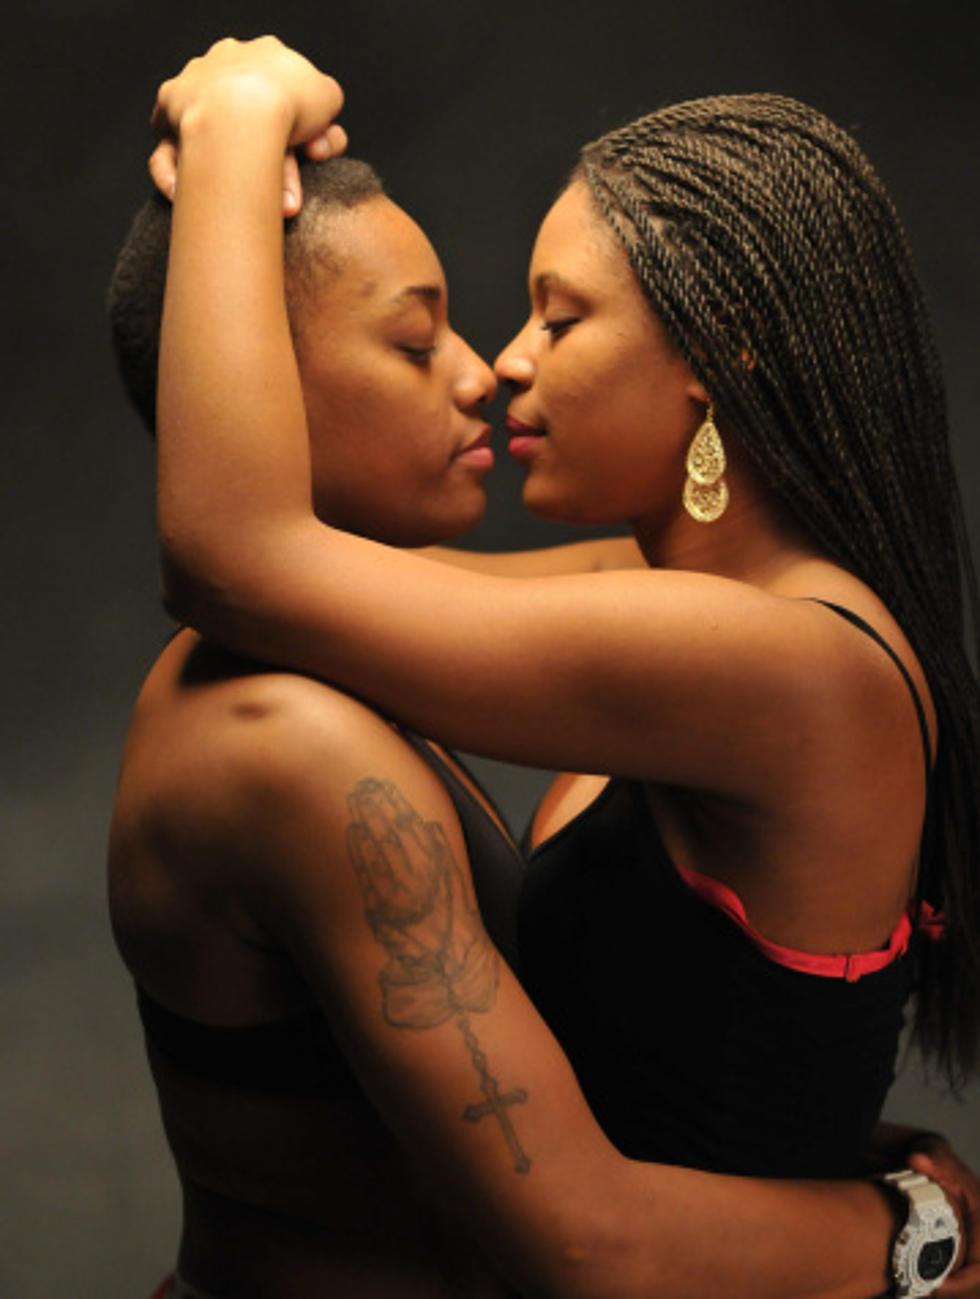 Public Lesbian Making Out